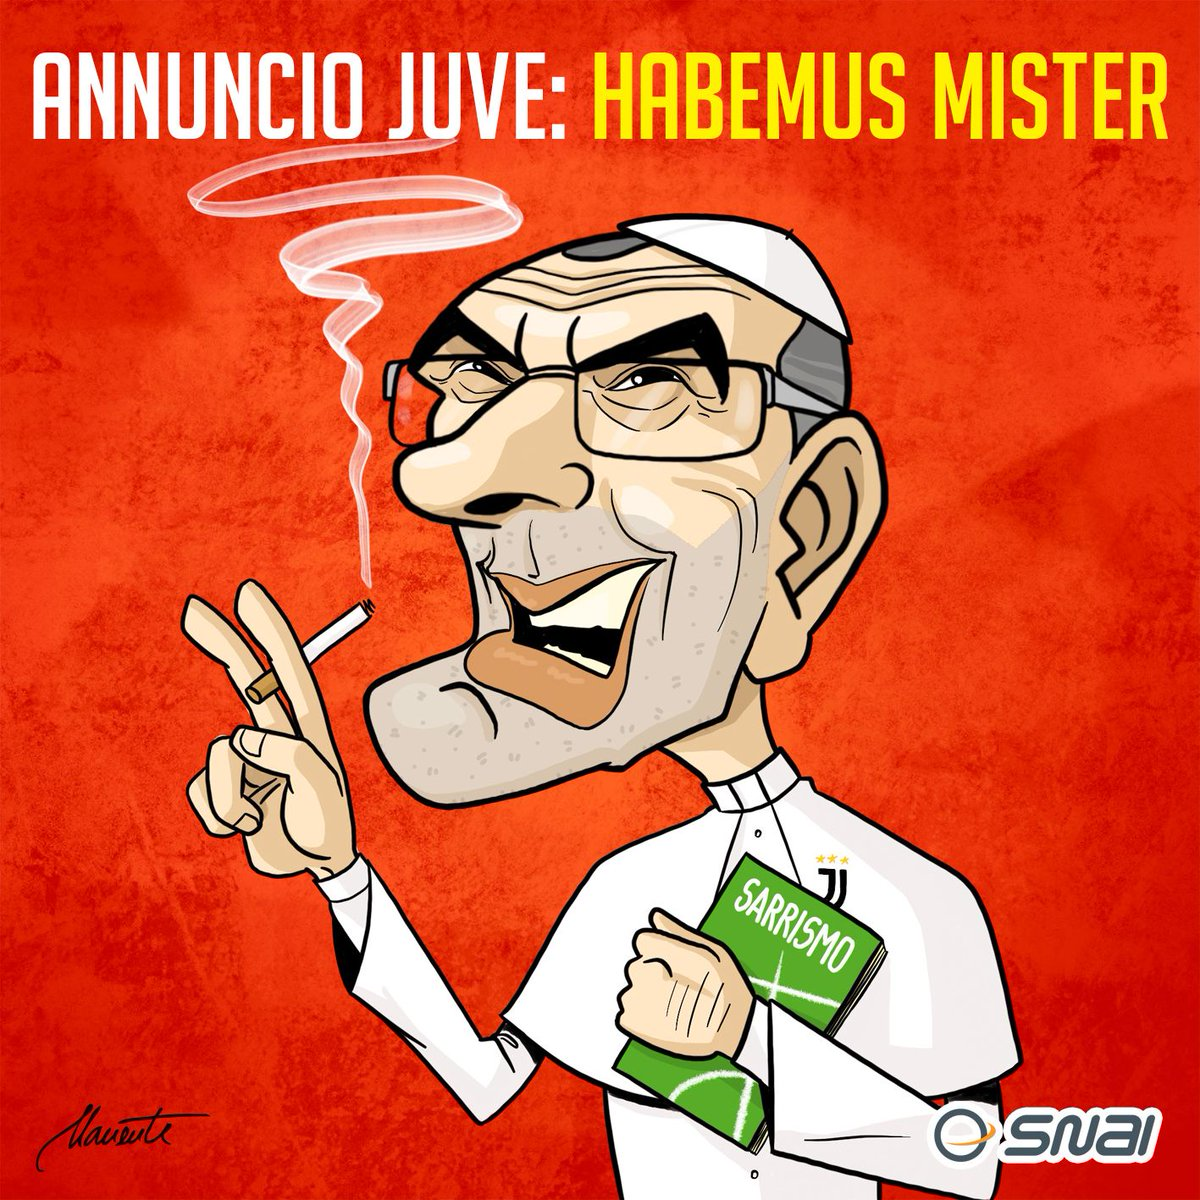 Fumata bianca da Torino: la #Juve annuncia #Sarri. 🌫️◼️ @Gazzetta_it @SkySport @skysportn @DAZN_IT @tackleduro @TopCalcio24 @Sport_Mediaset #calcio #satira #disegno #vignetta #Juventus @juventusfc @sarrismofficial